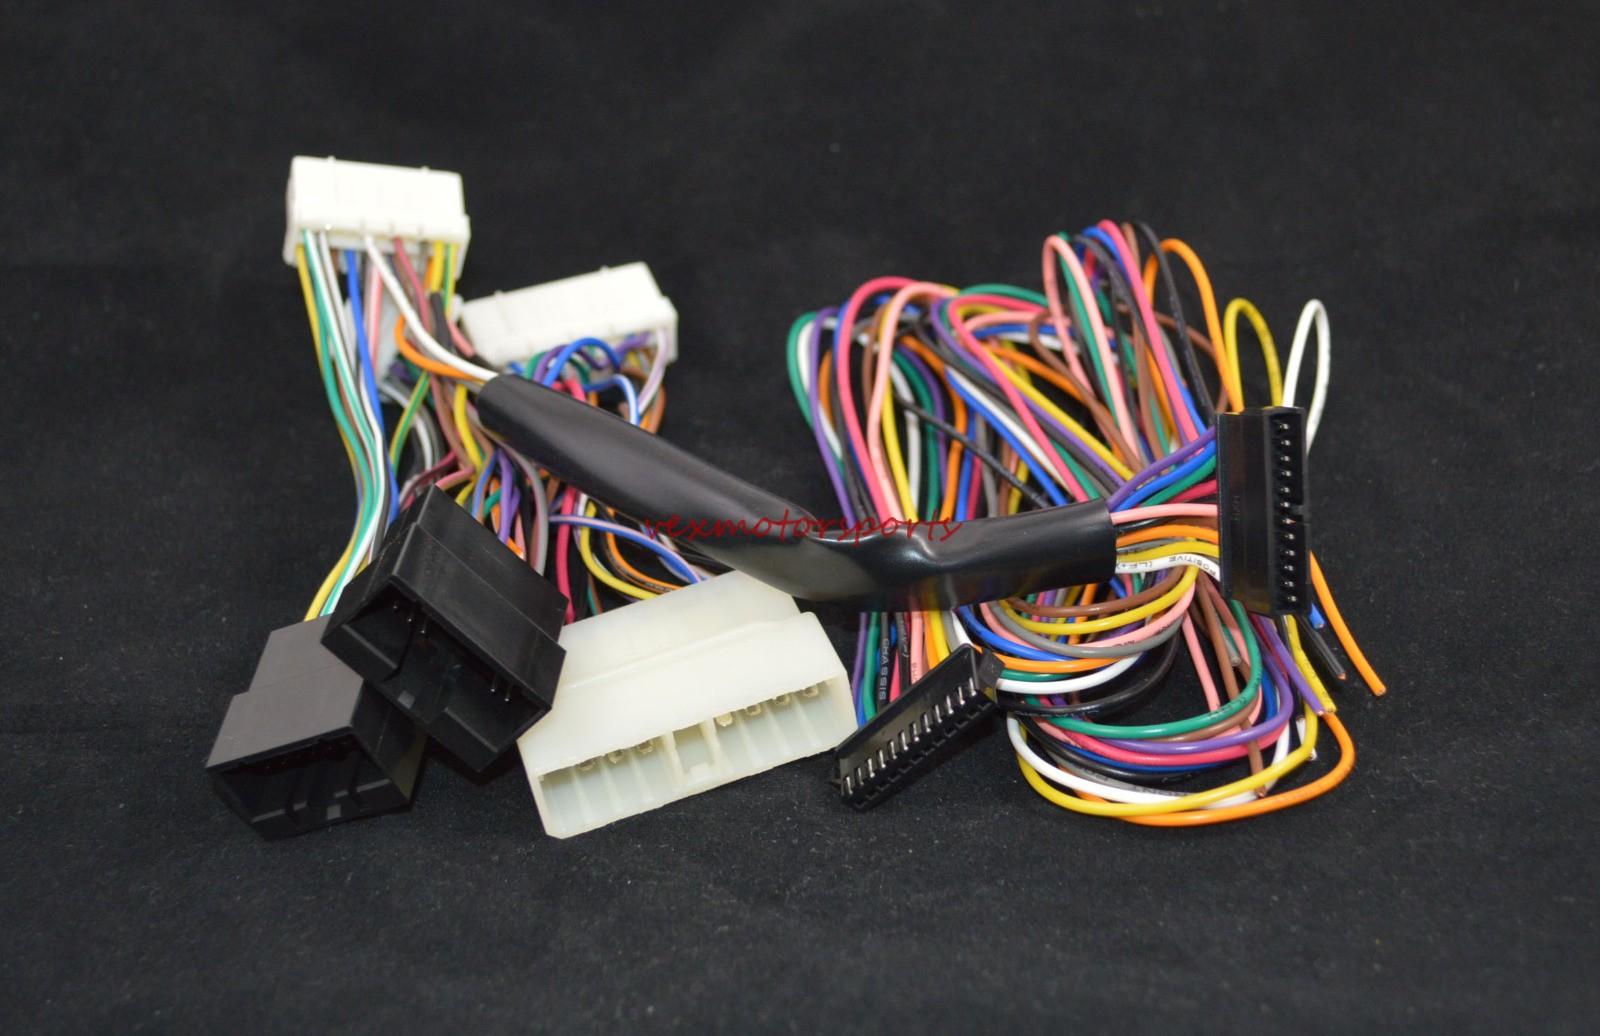 obd1 honda wiring diagram obd1 honda wire harness #7